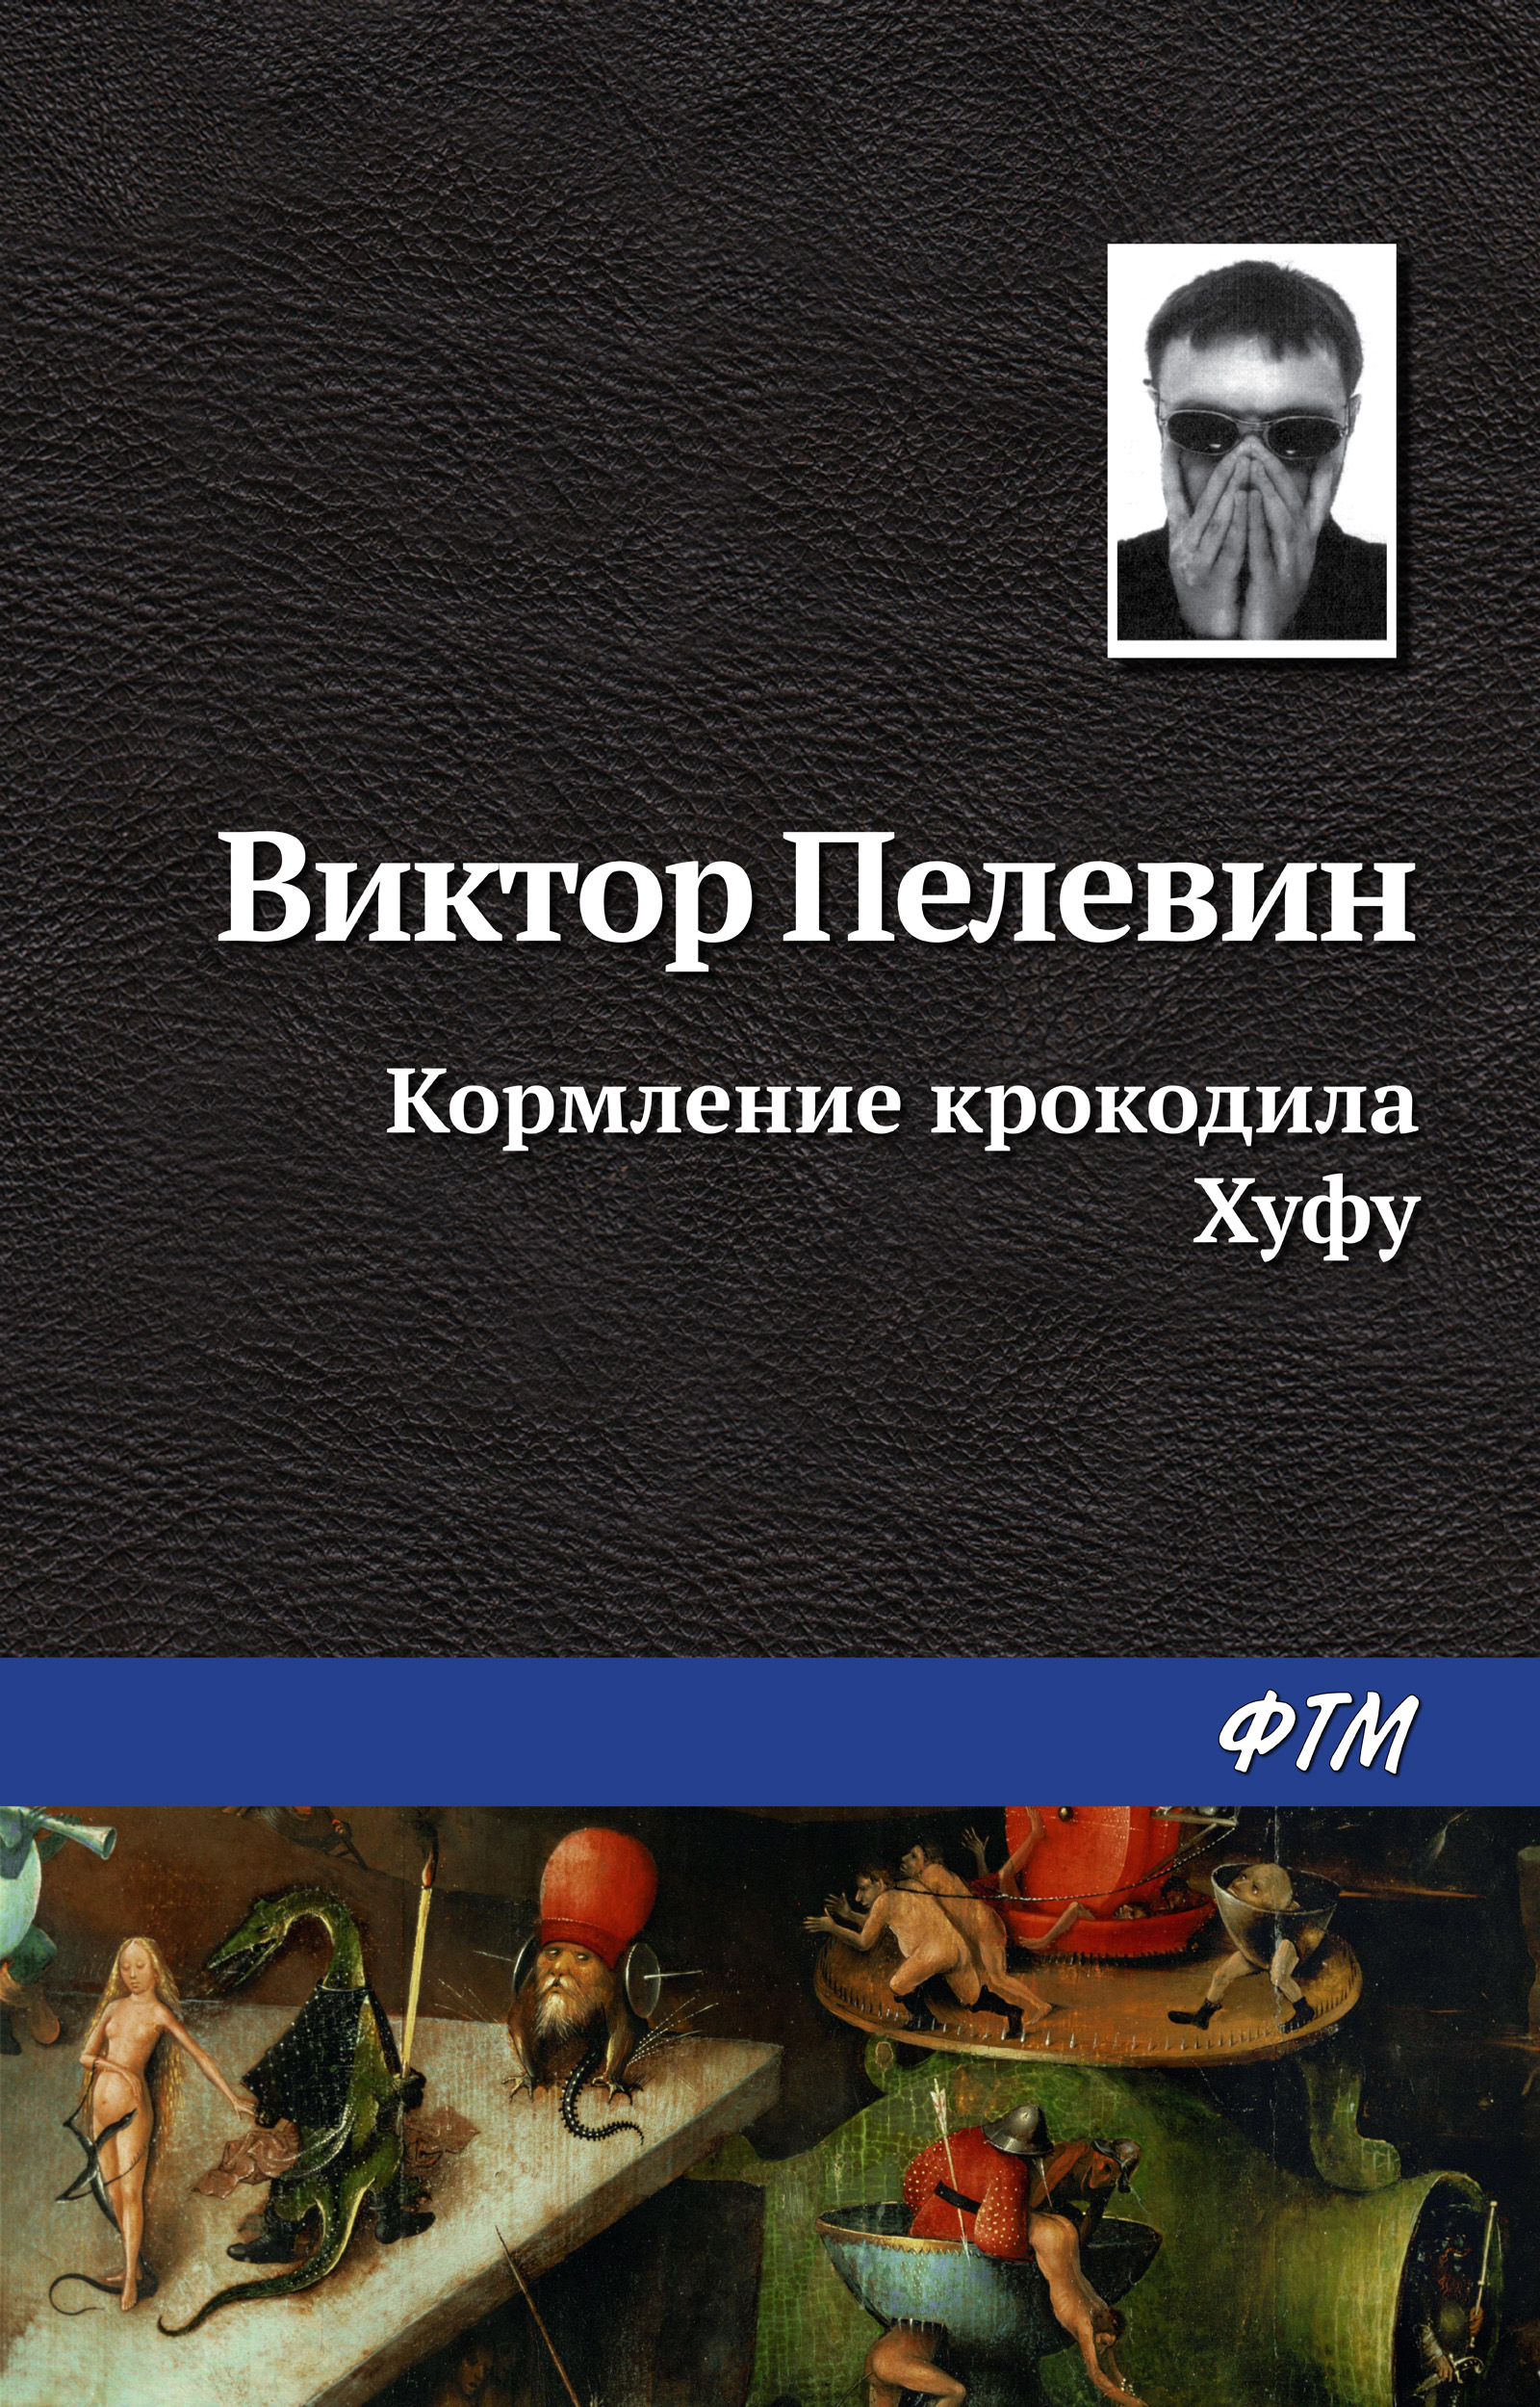 Виктор Пелевин «Кормление крокодила Хуфу»